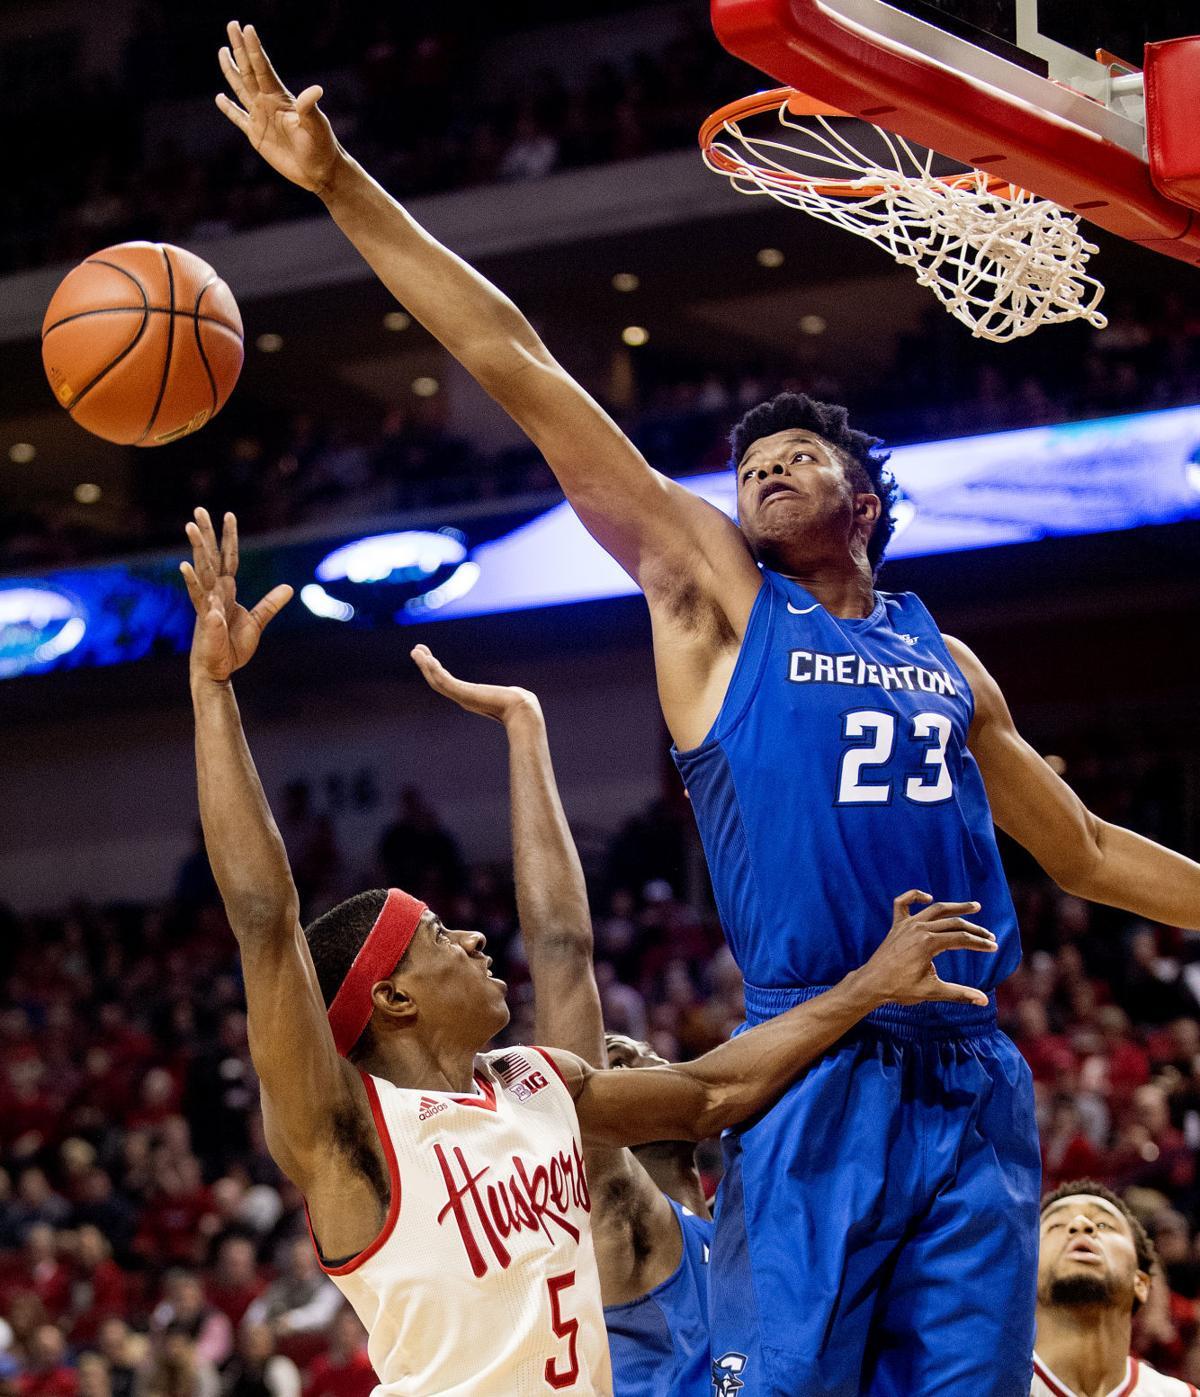 Creighton vs. Nebraska basketball, 12/7